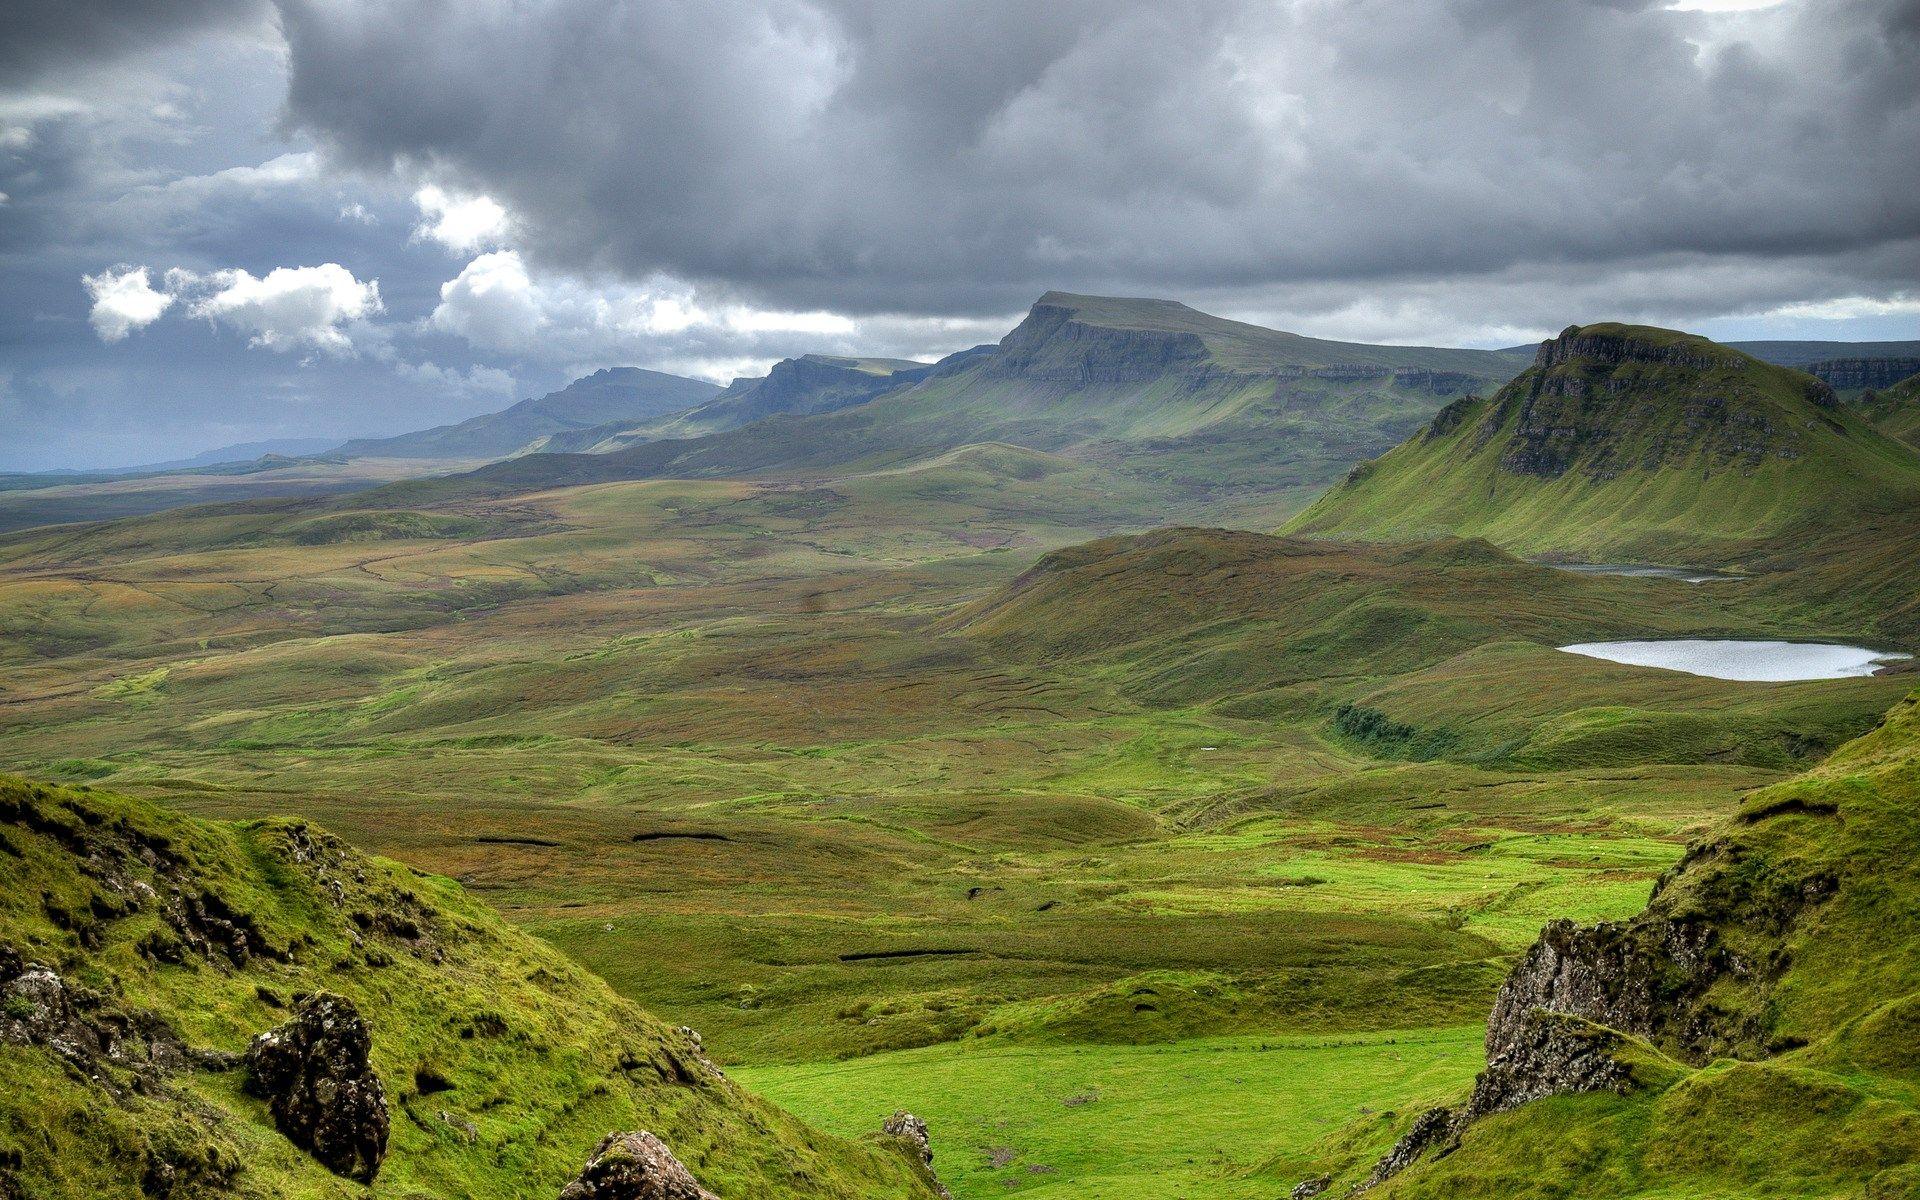 1920x1200 Free Computer Landscape Mountain Images Scotland Mountains Nature Wallpaper